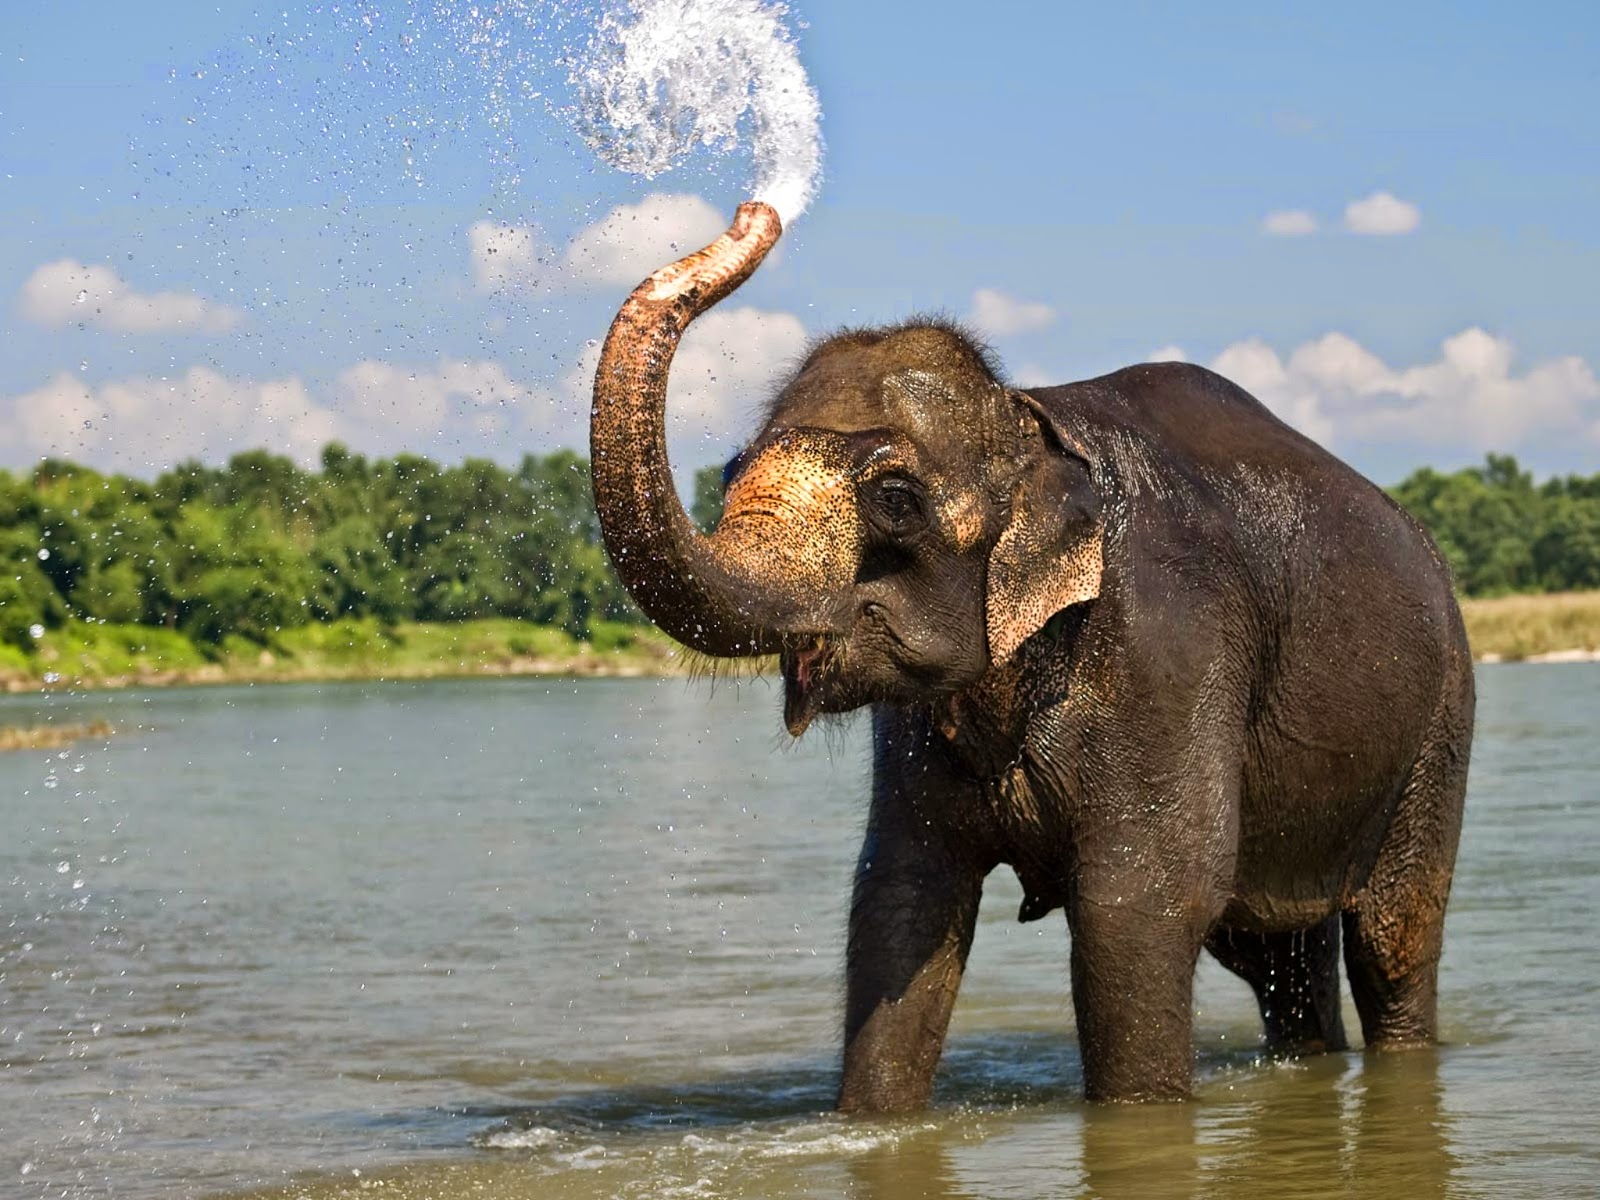 Beautiful Elephant Images HD Wallpaper